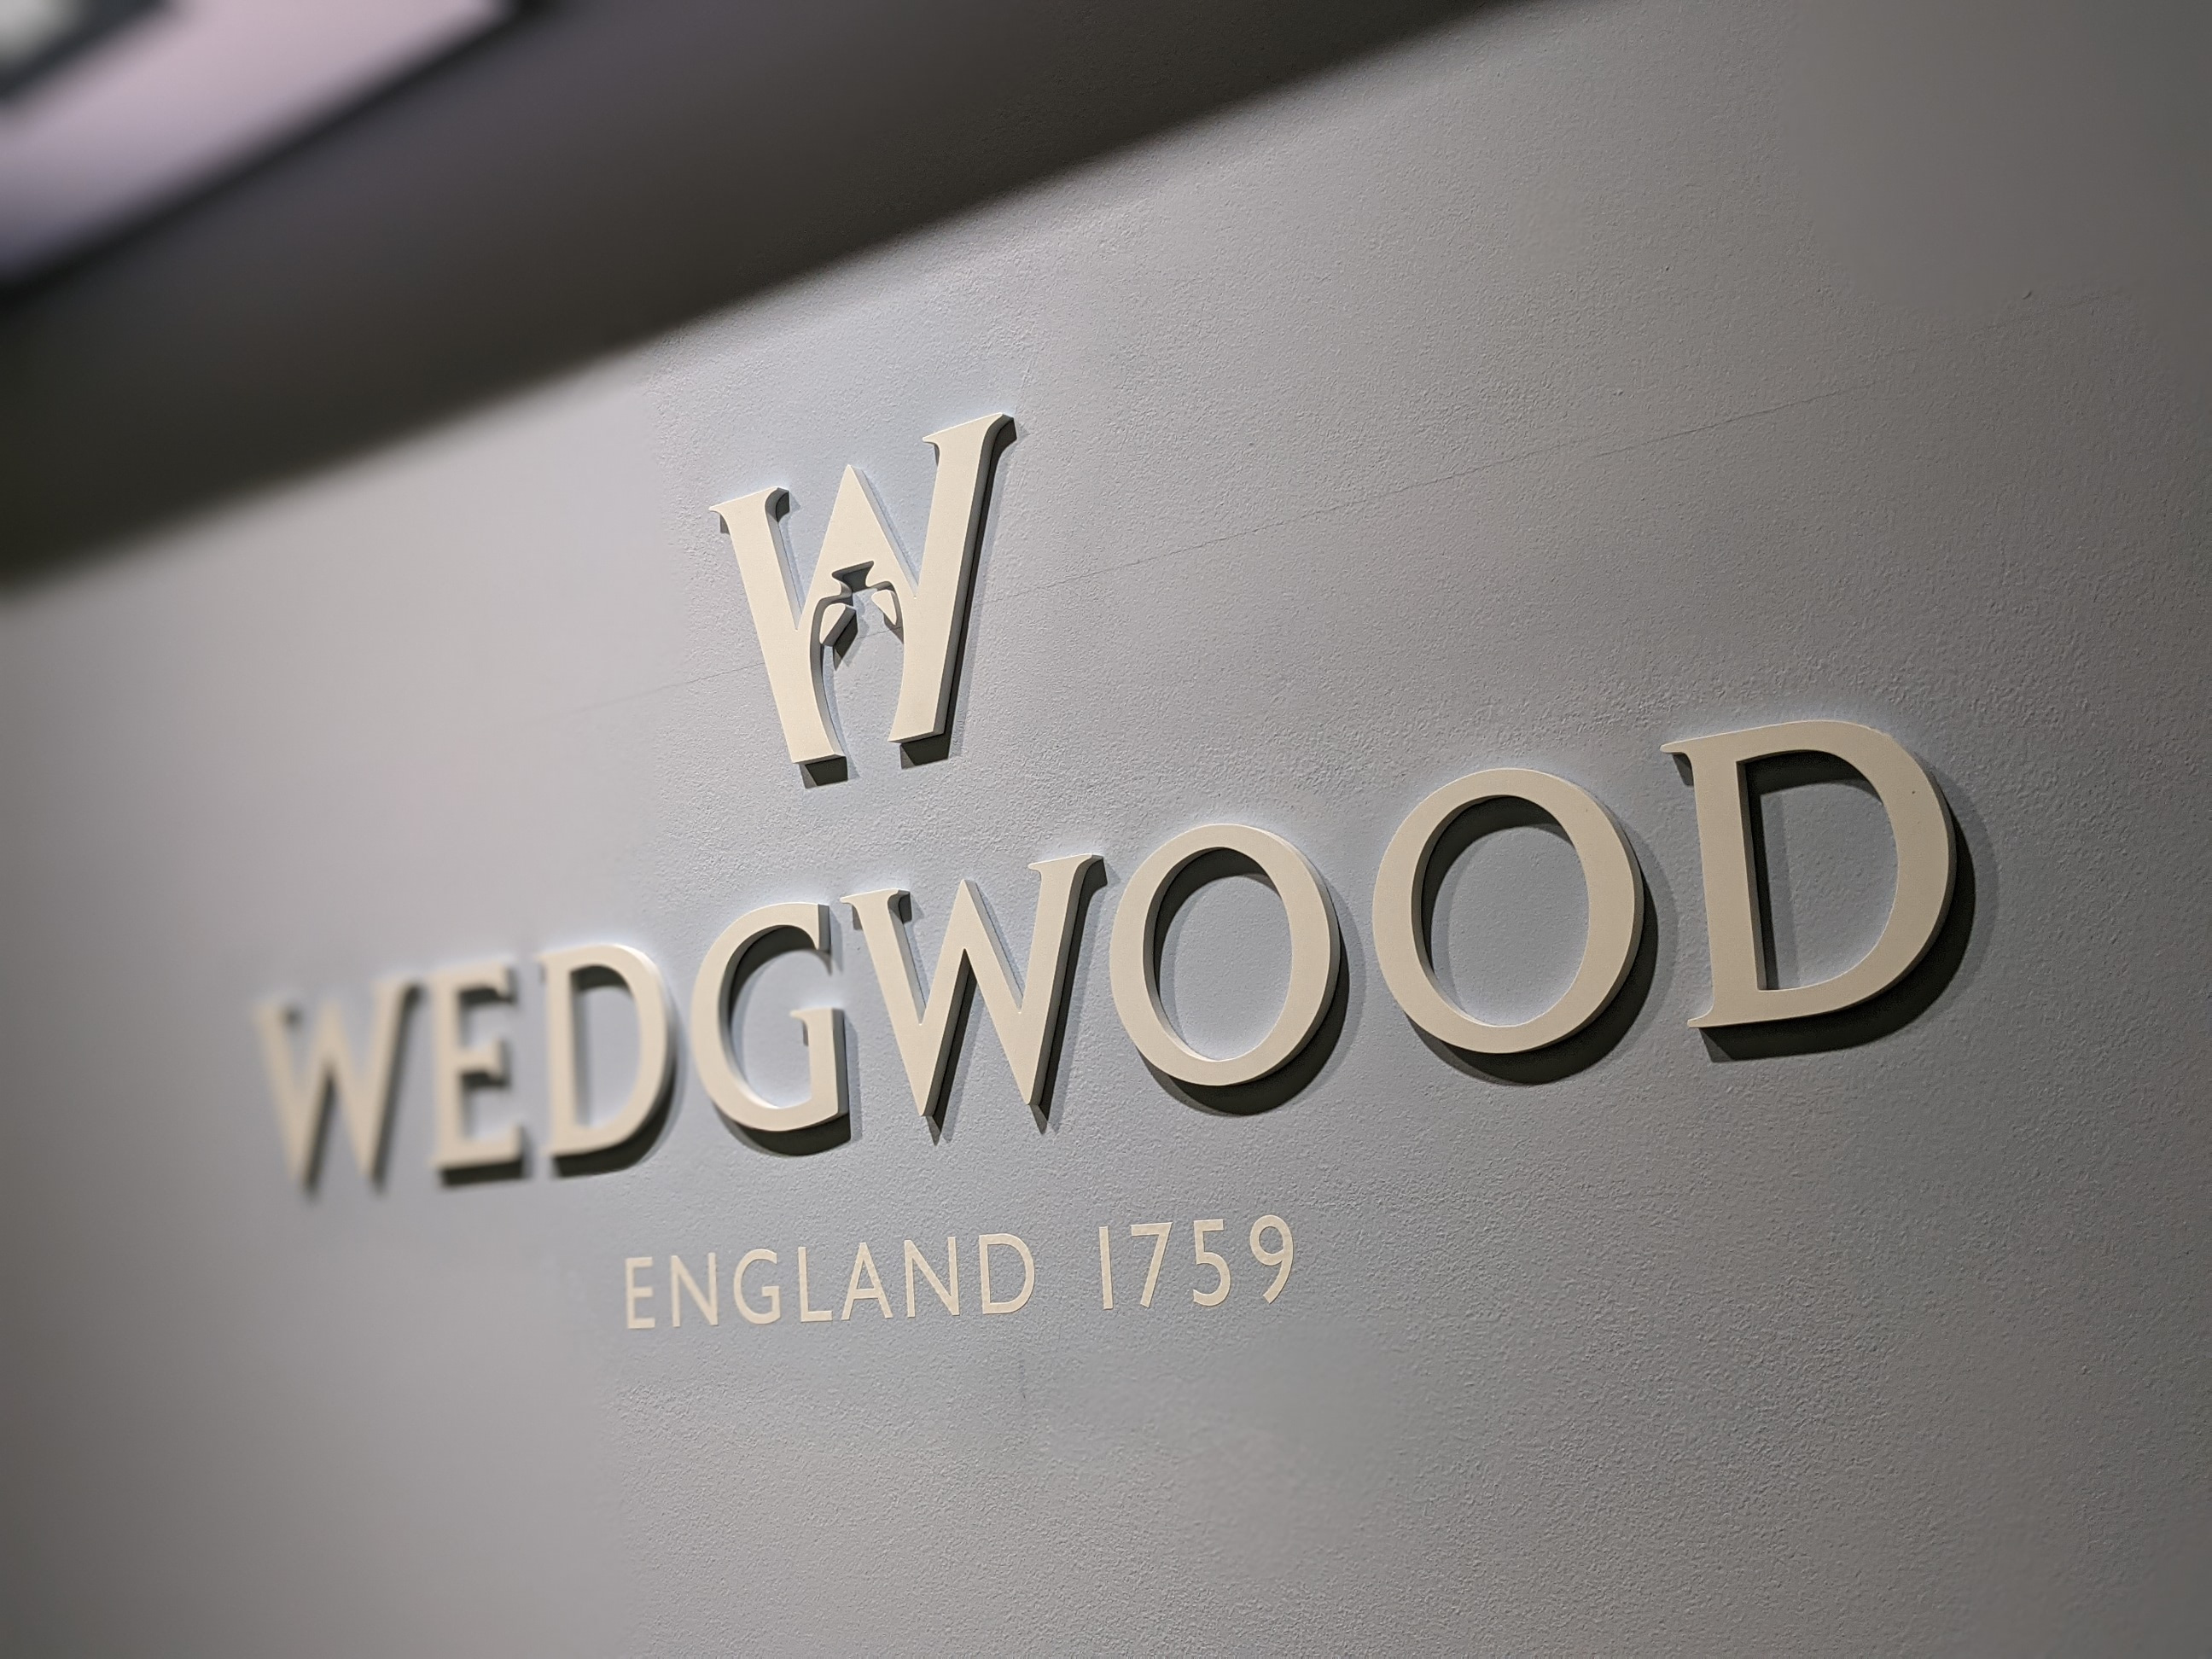 Wedgwood商品の意味は「結婚」への温かいメッセージ